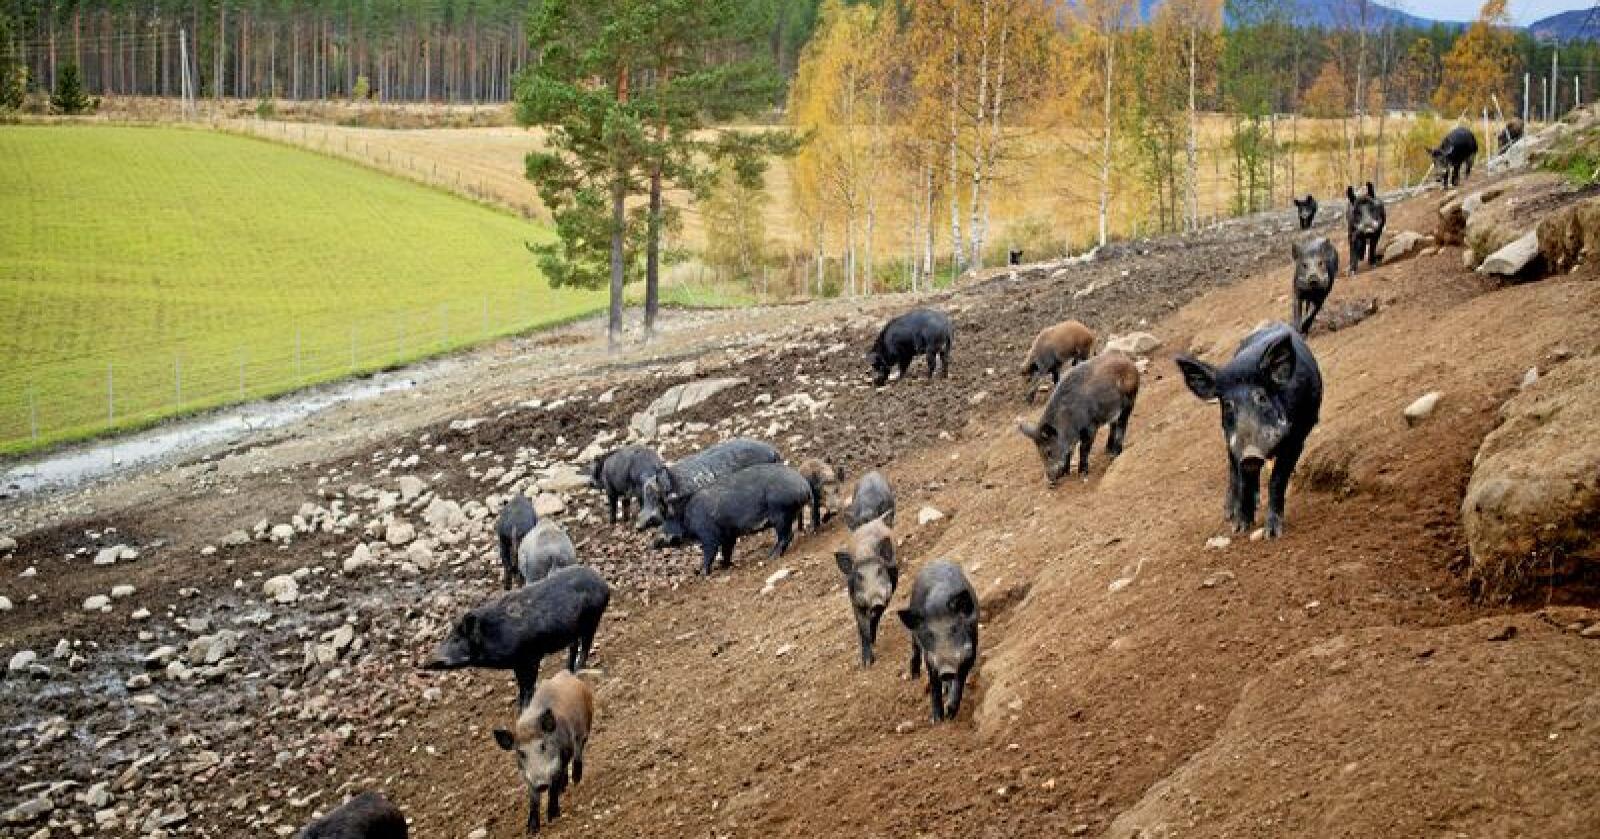 Frankrike vil gjerde de belgiske svina ute. Her fra tamme villsvin i Hallingby. Foto: Kyrre Lien / NTB scanpix